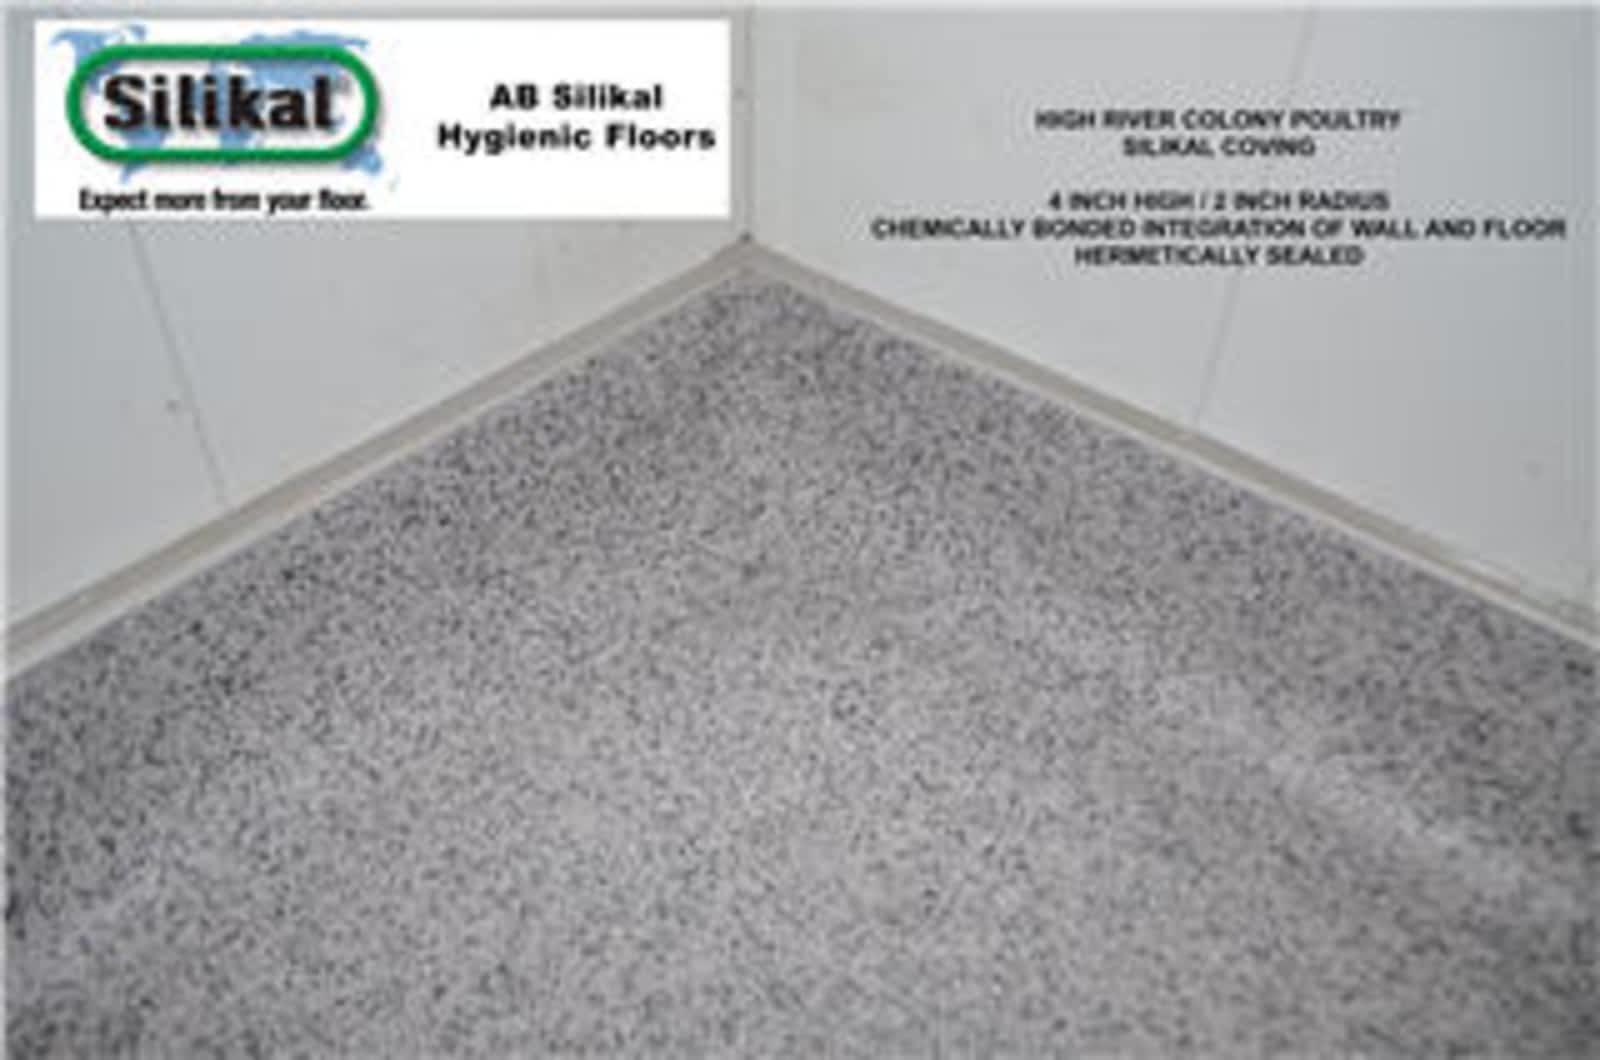 SureBond Safe Floors (Div Of Diamond Hard Surfaces Calgary Inc)   Opening  Hours   10 6420 79 Ave SE, Calgary, AB